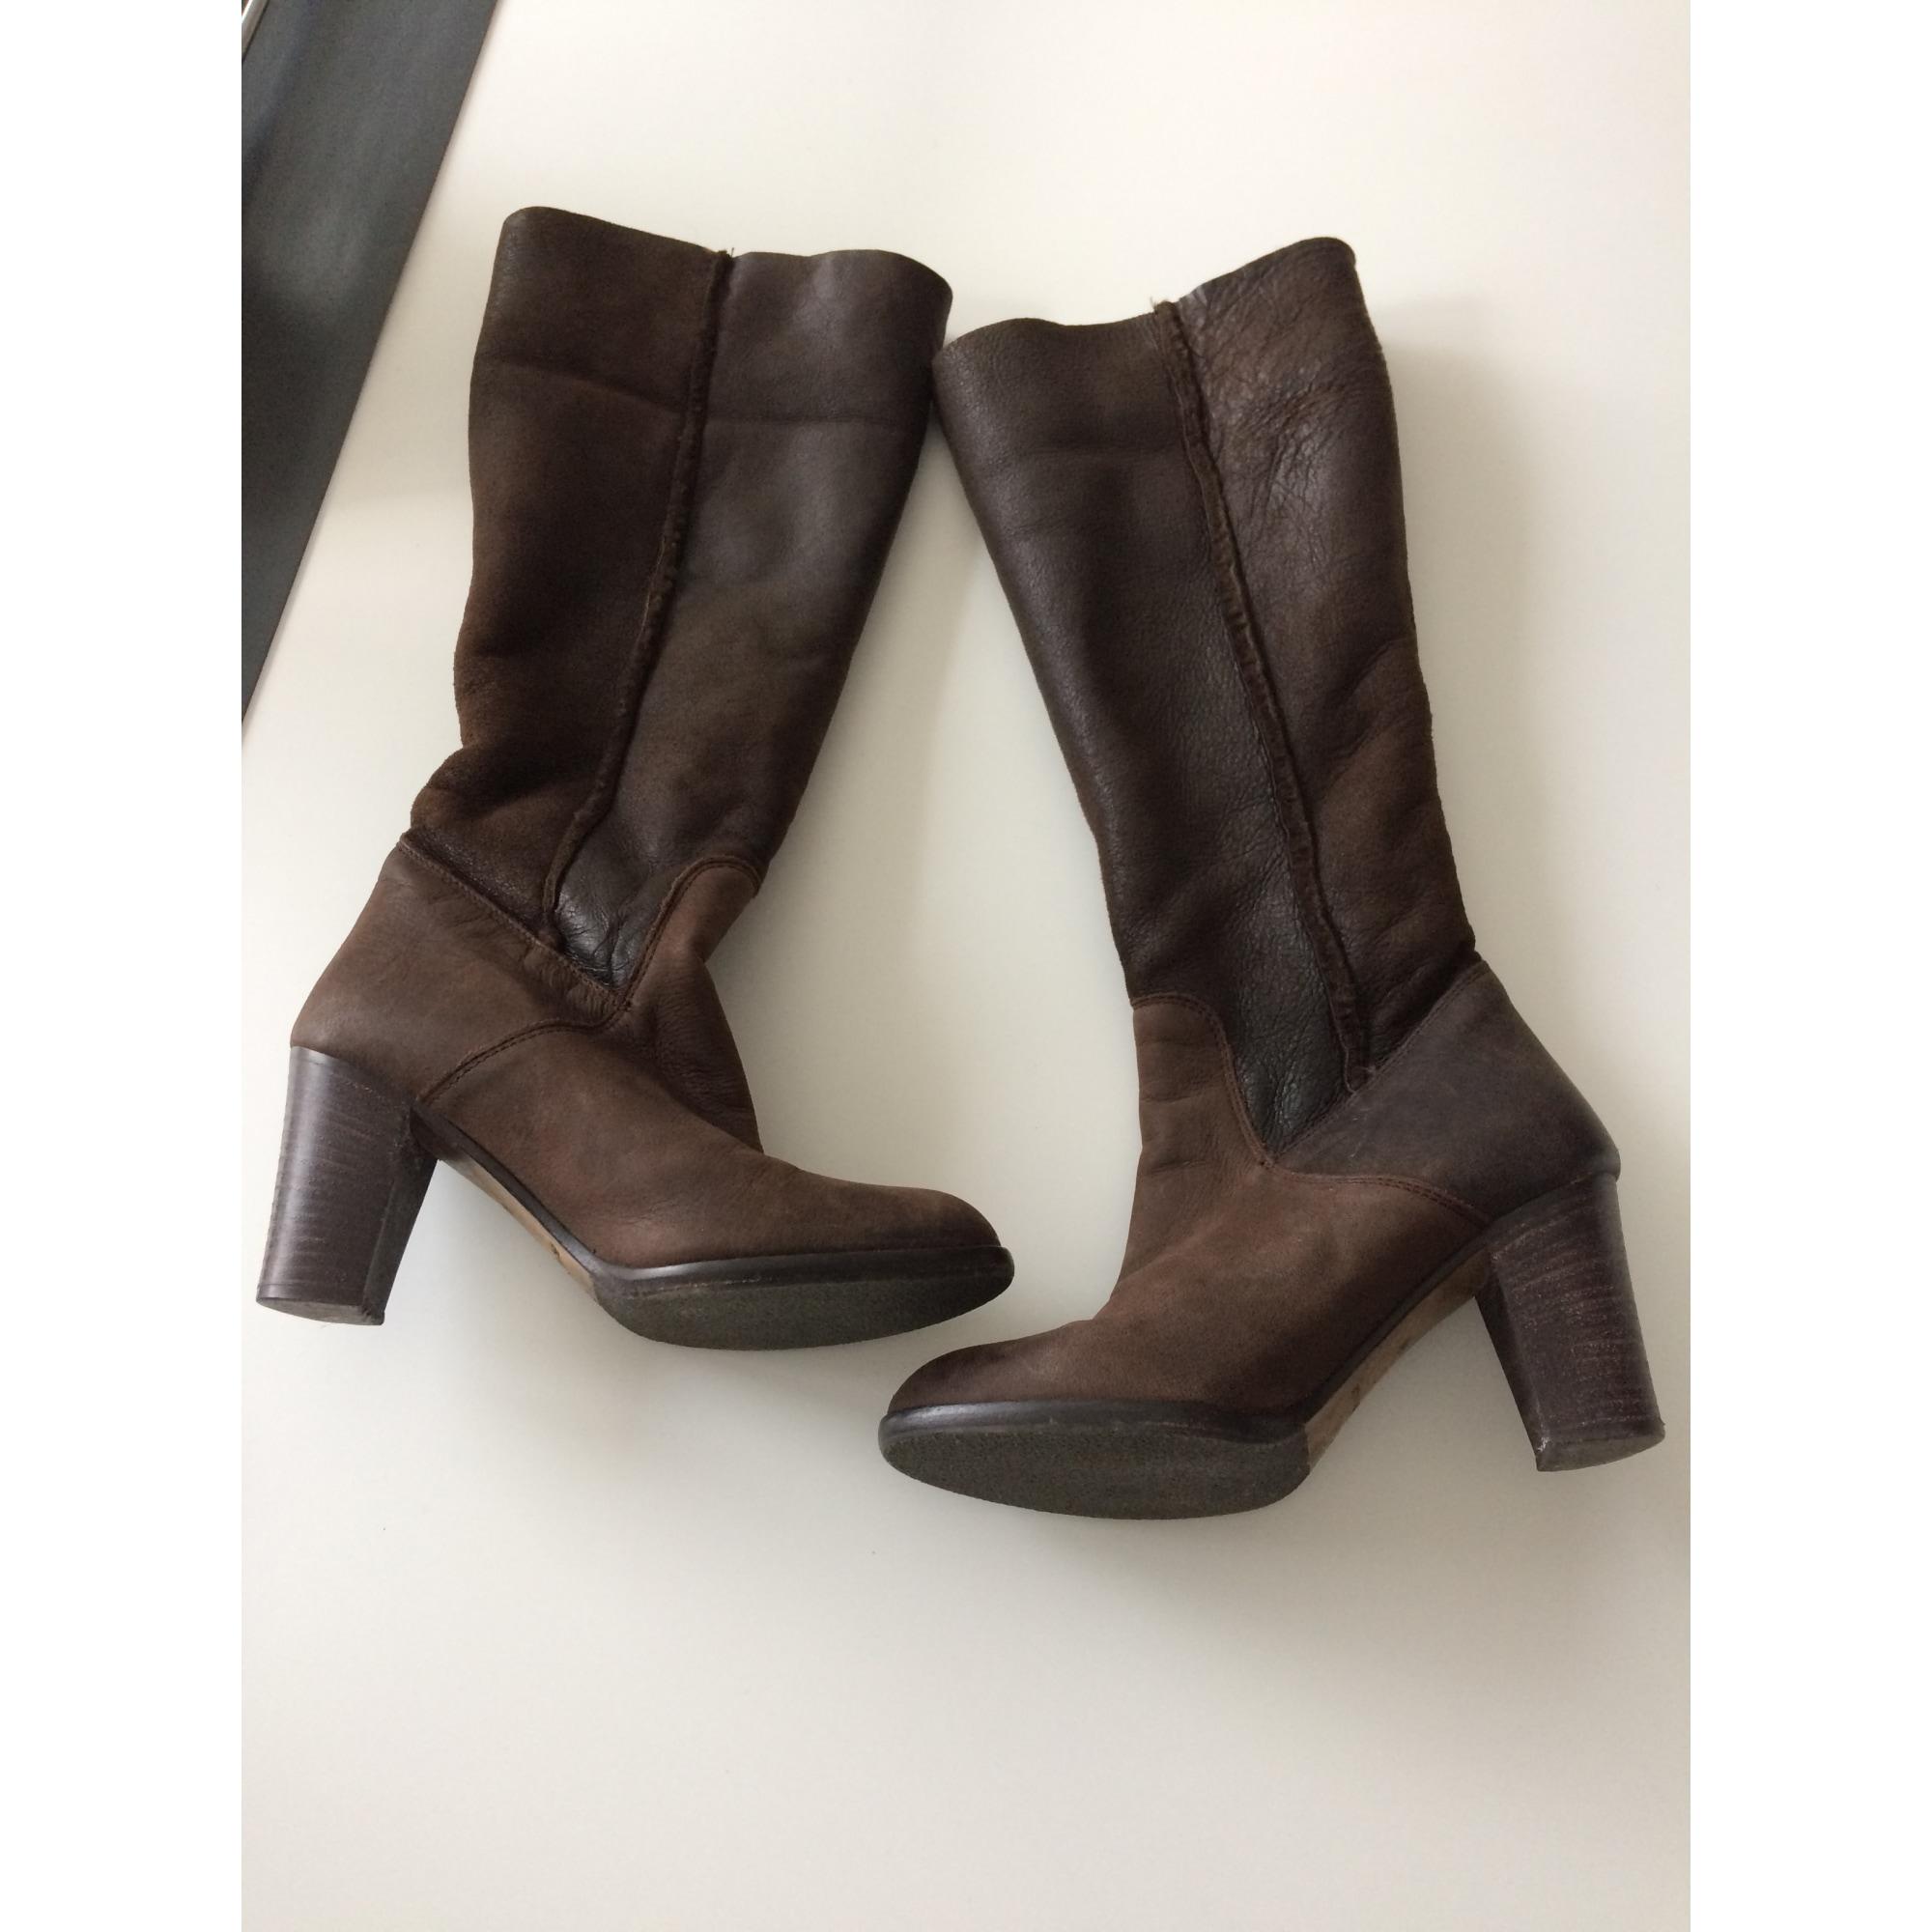 301713f1a9aa91 High Heel Boots VERO CUOIO 36 brown - 7623113